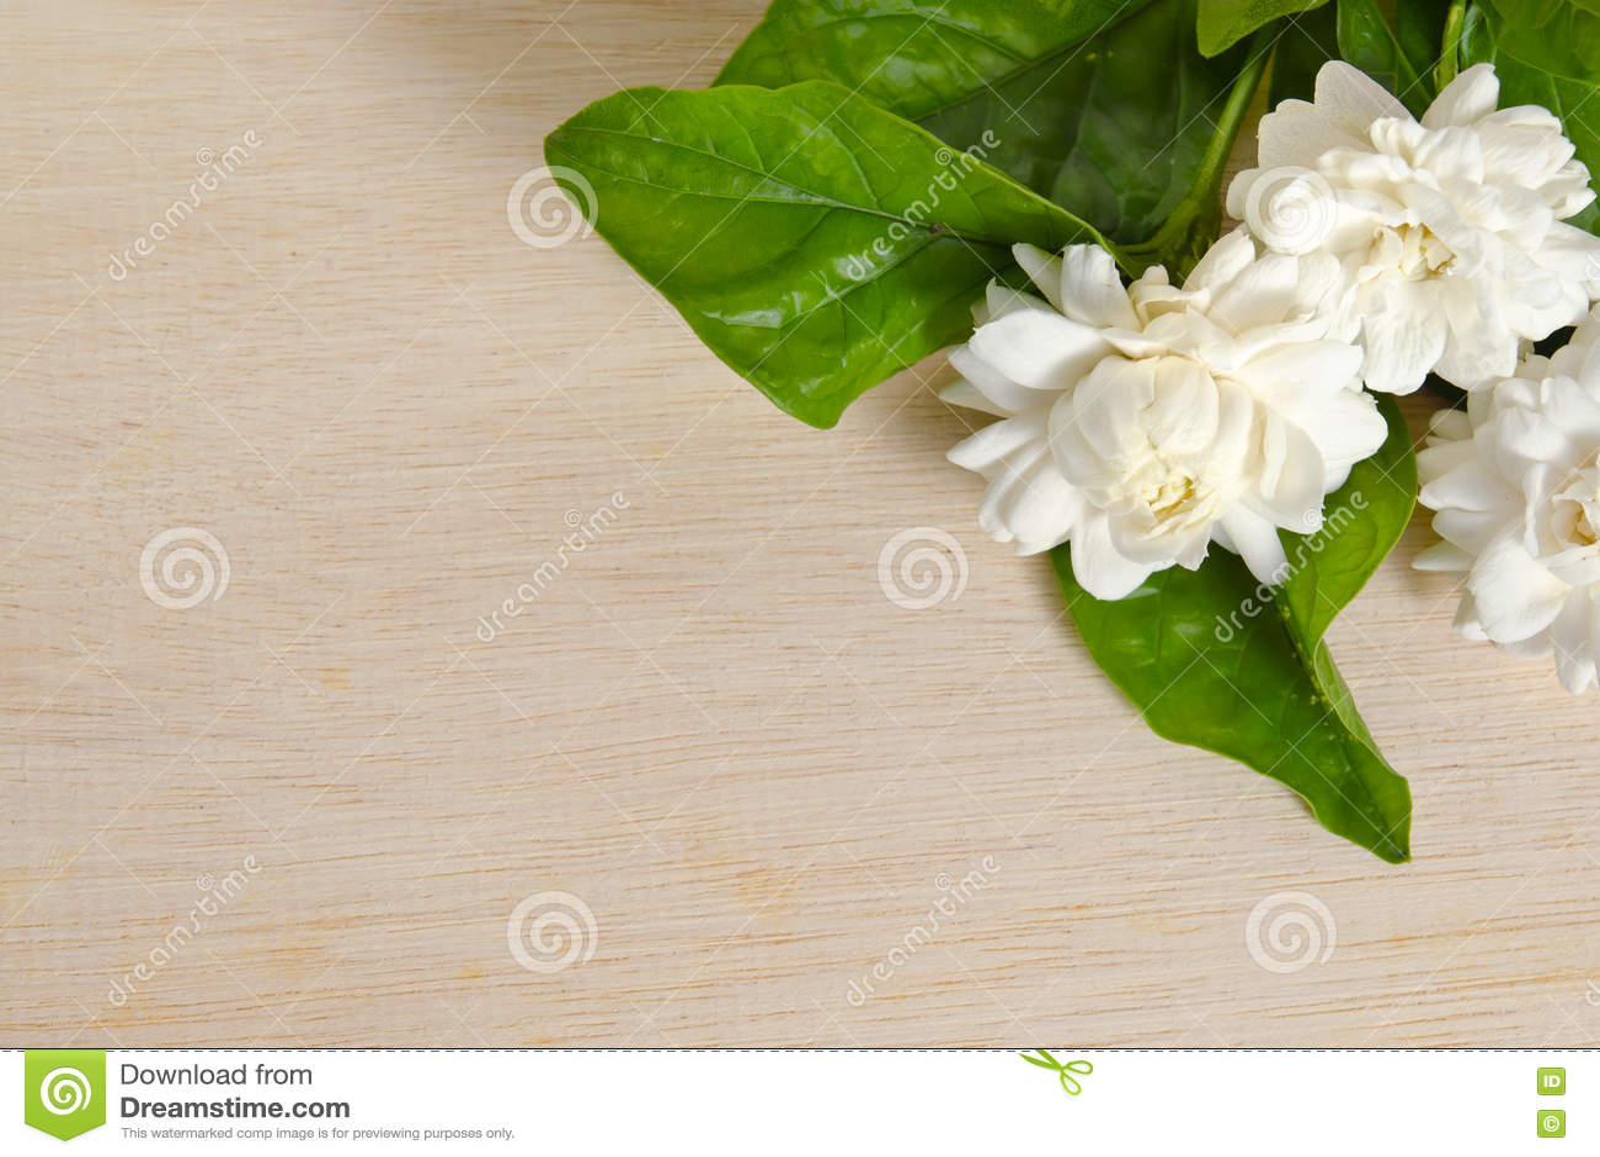 Jasmine flowers grouped on wooden board background stock photo jasmine flowers grouped on wooden board background izmirmasajfo